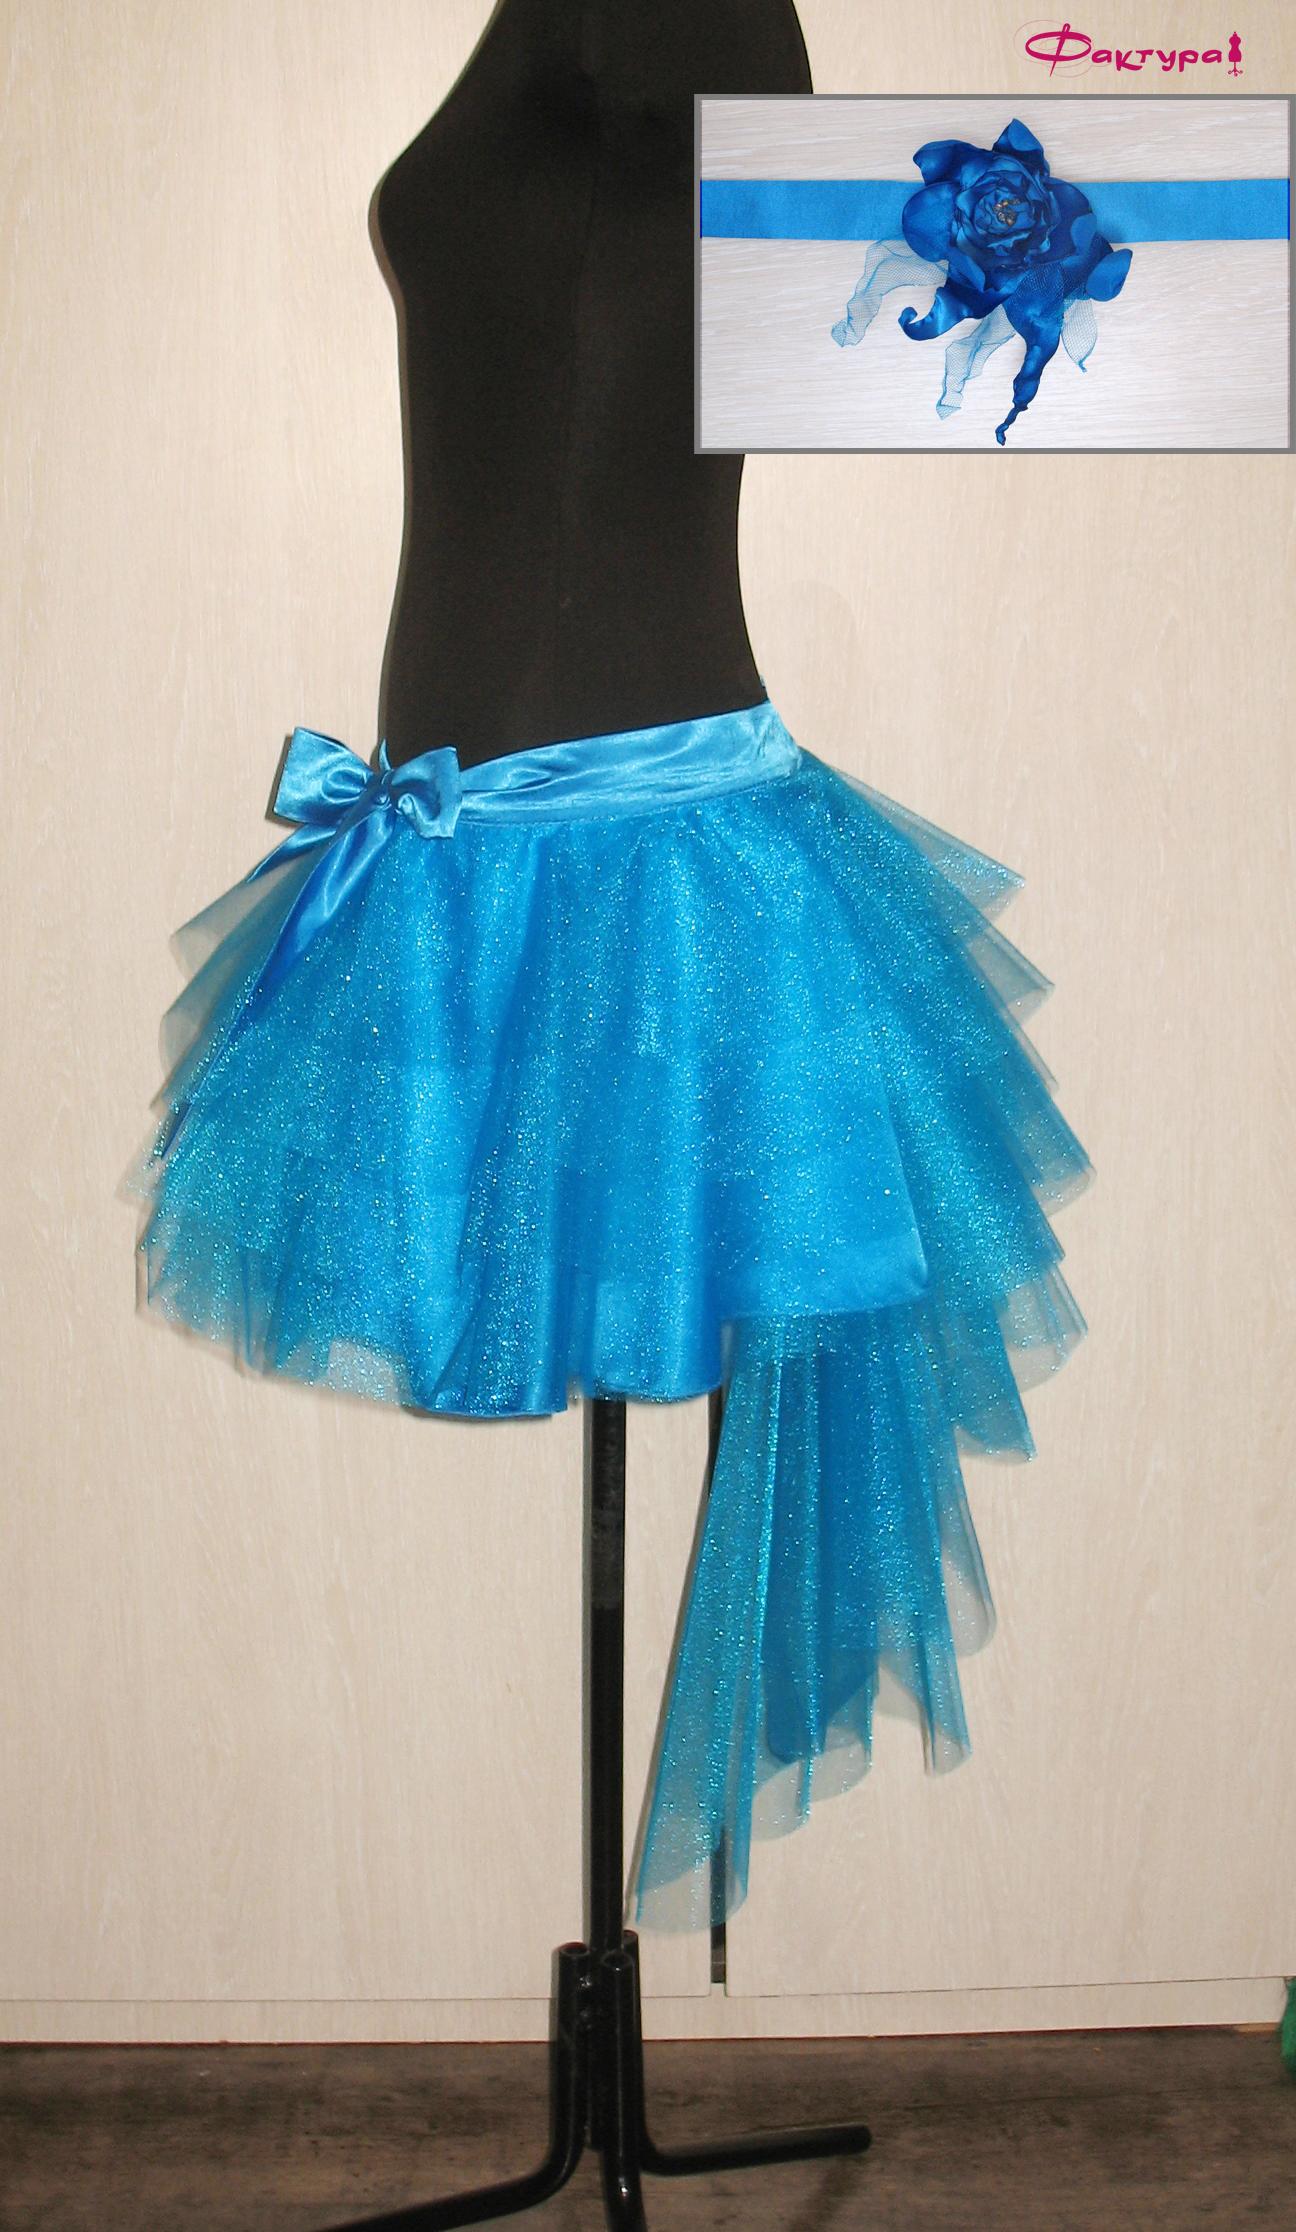 Как сшить юбку-пачку со шлейфом из сетки фатина MK-costumier 65